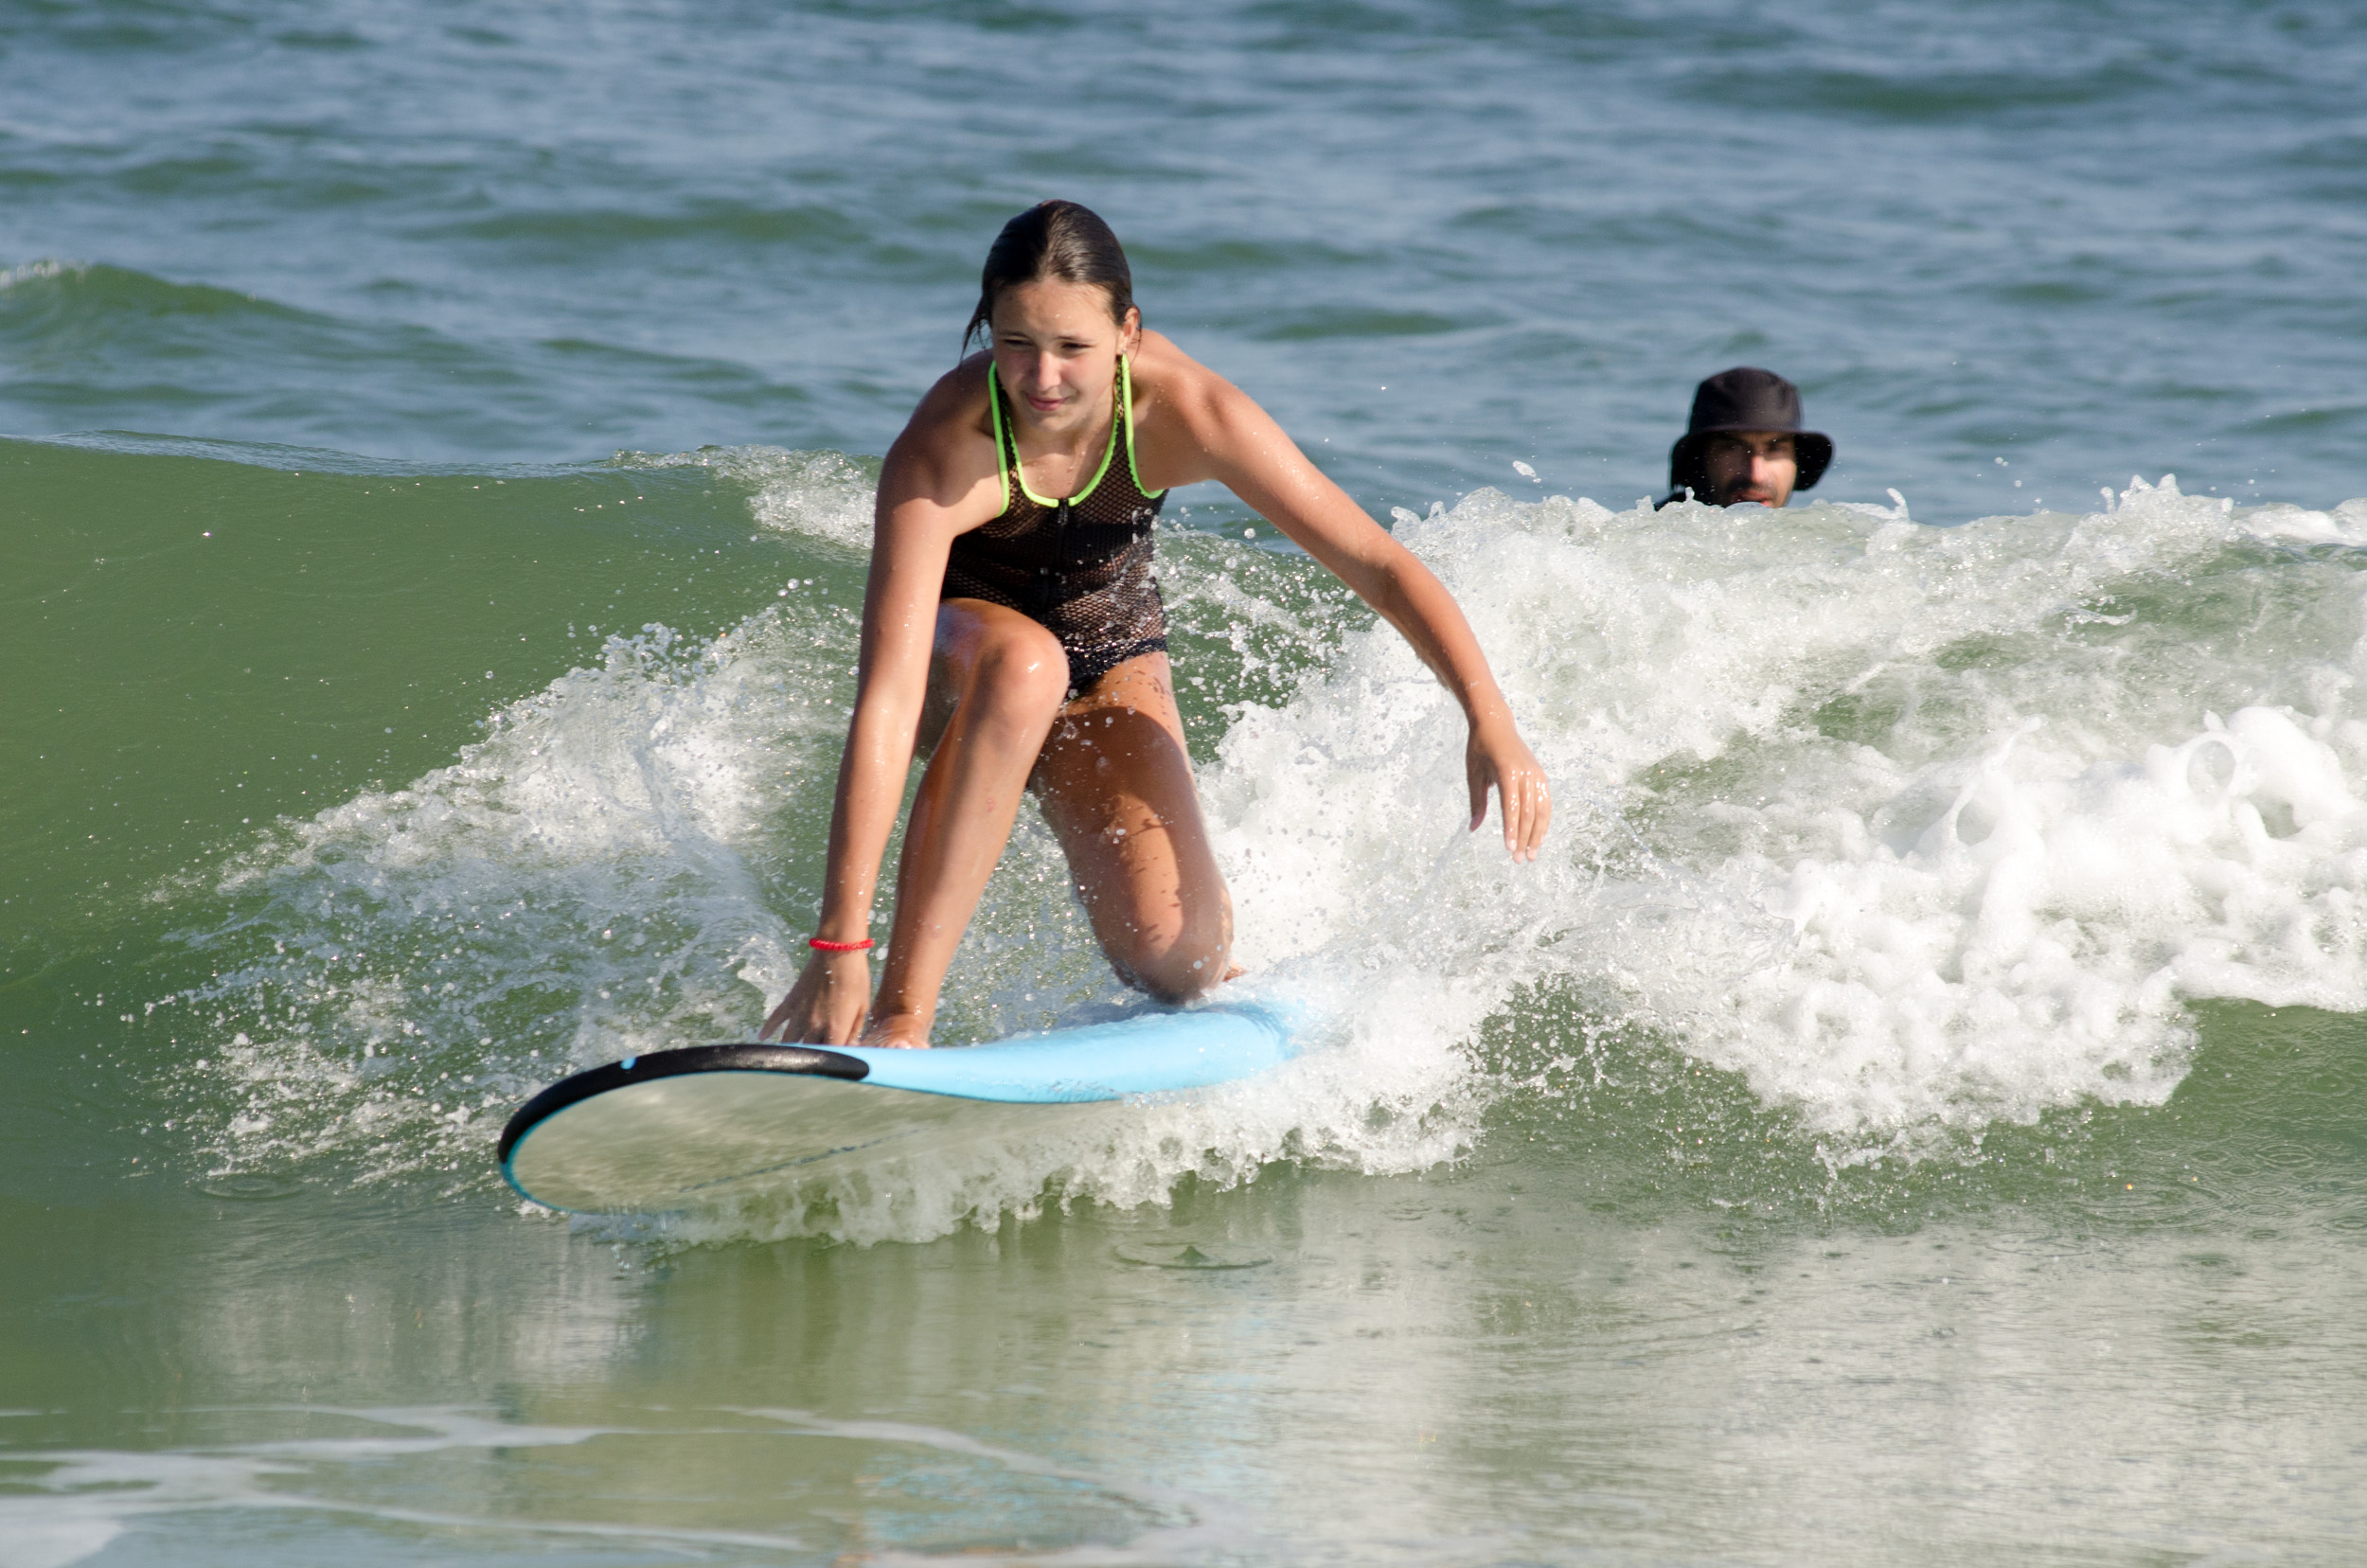 Term_Surfing_WW_7822